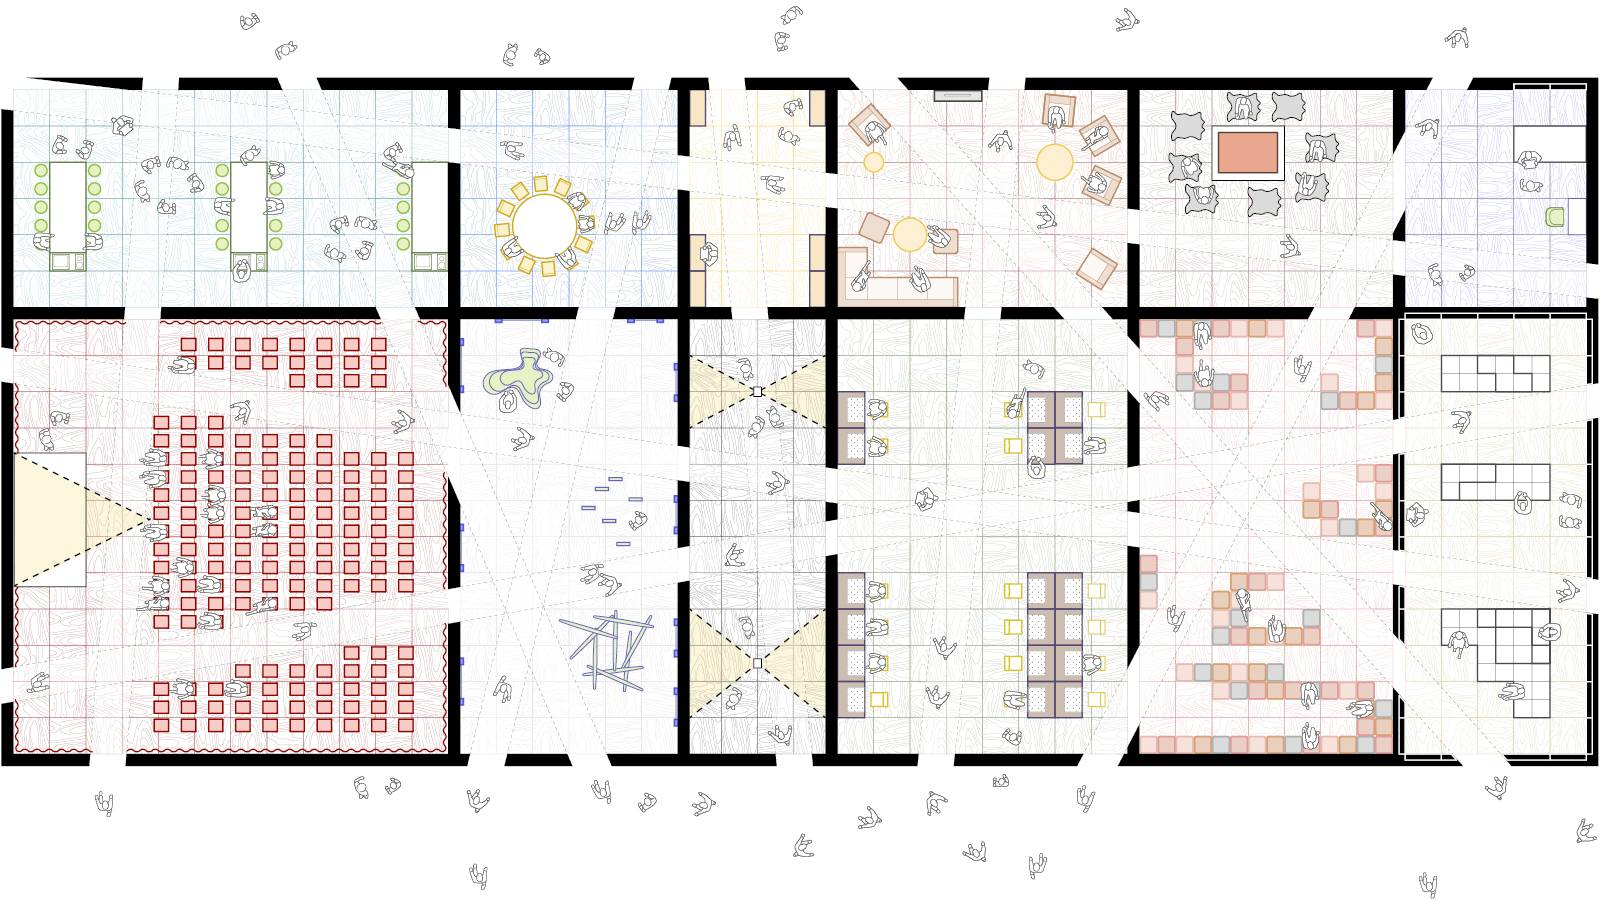 PAVILION PLAN WITH CUTS - Frankfurt Book Fair Pavilion - SPOL Architects